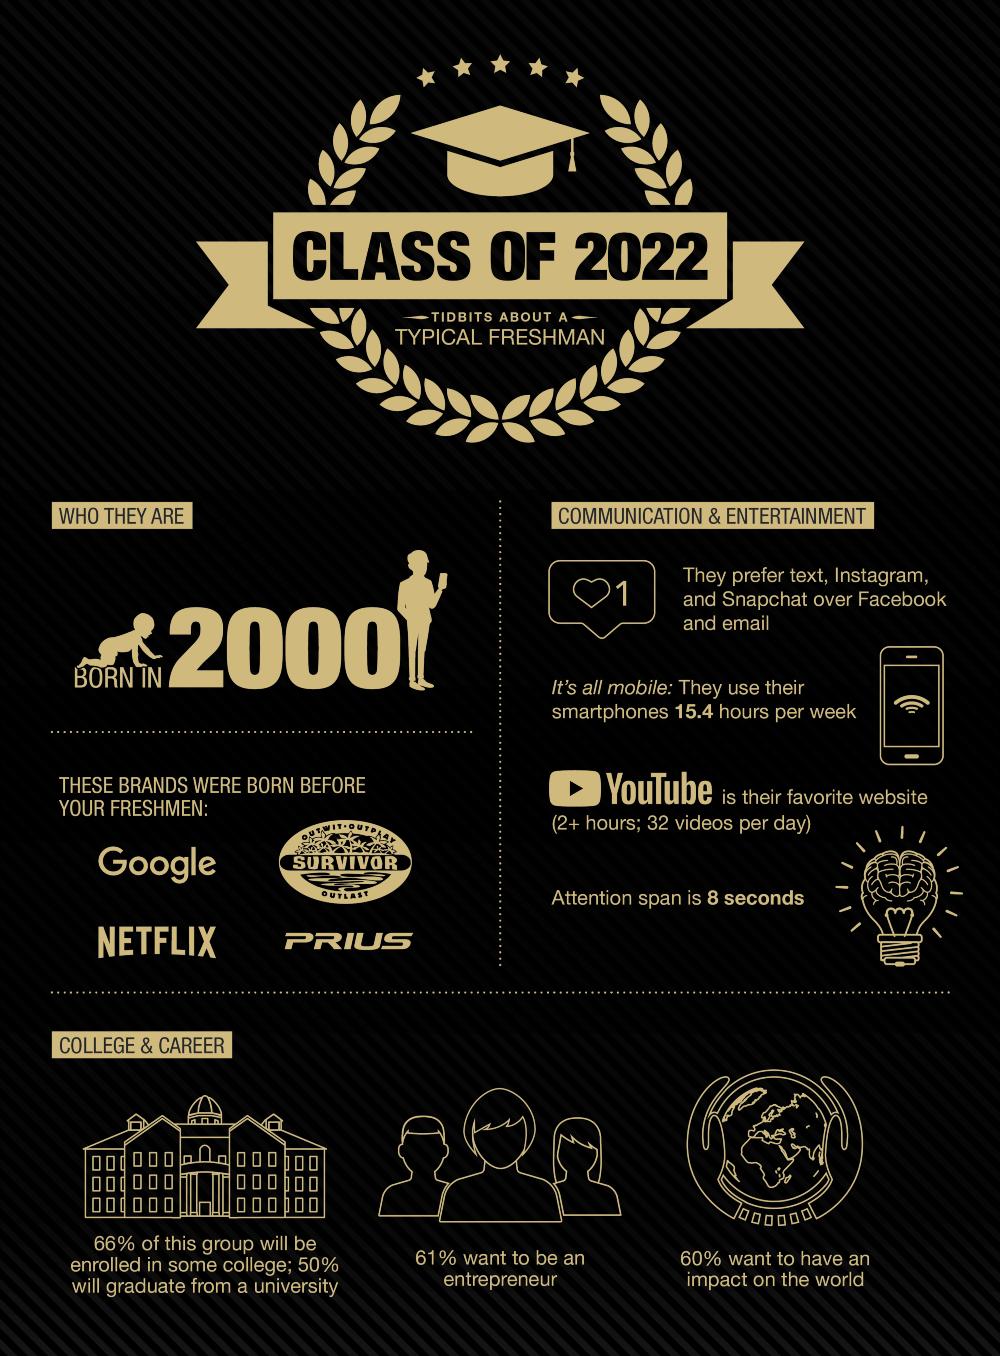 Cu Boulder Calendar 2022.Class Of 2022 Tidbits About A Typical Freshman Leeds School Of Business University Of Colorado Boulder